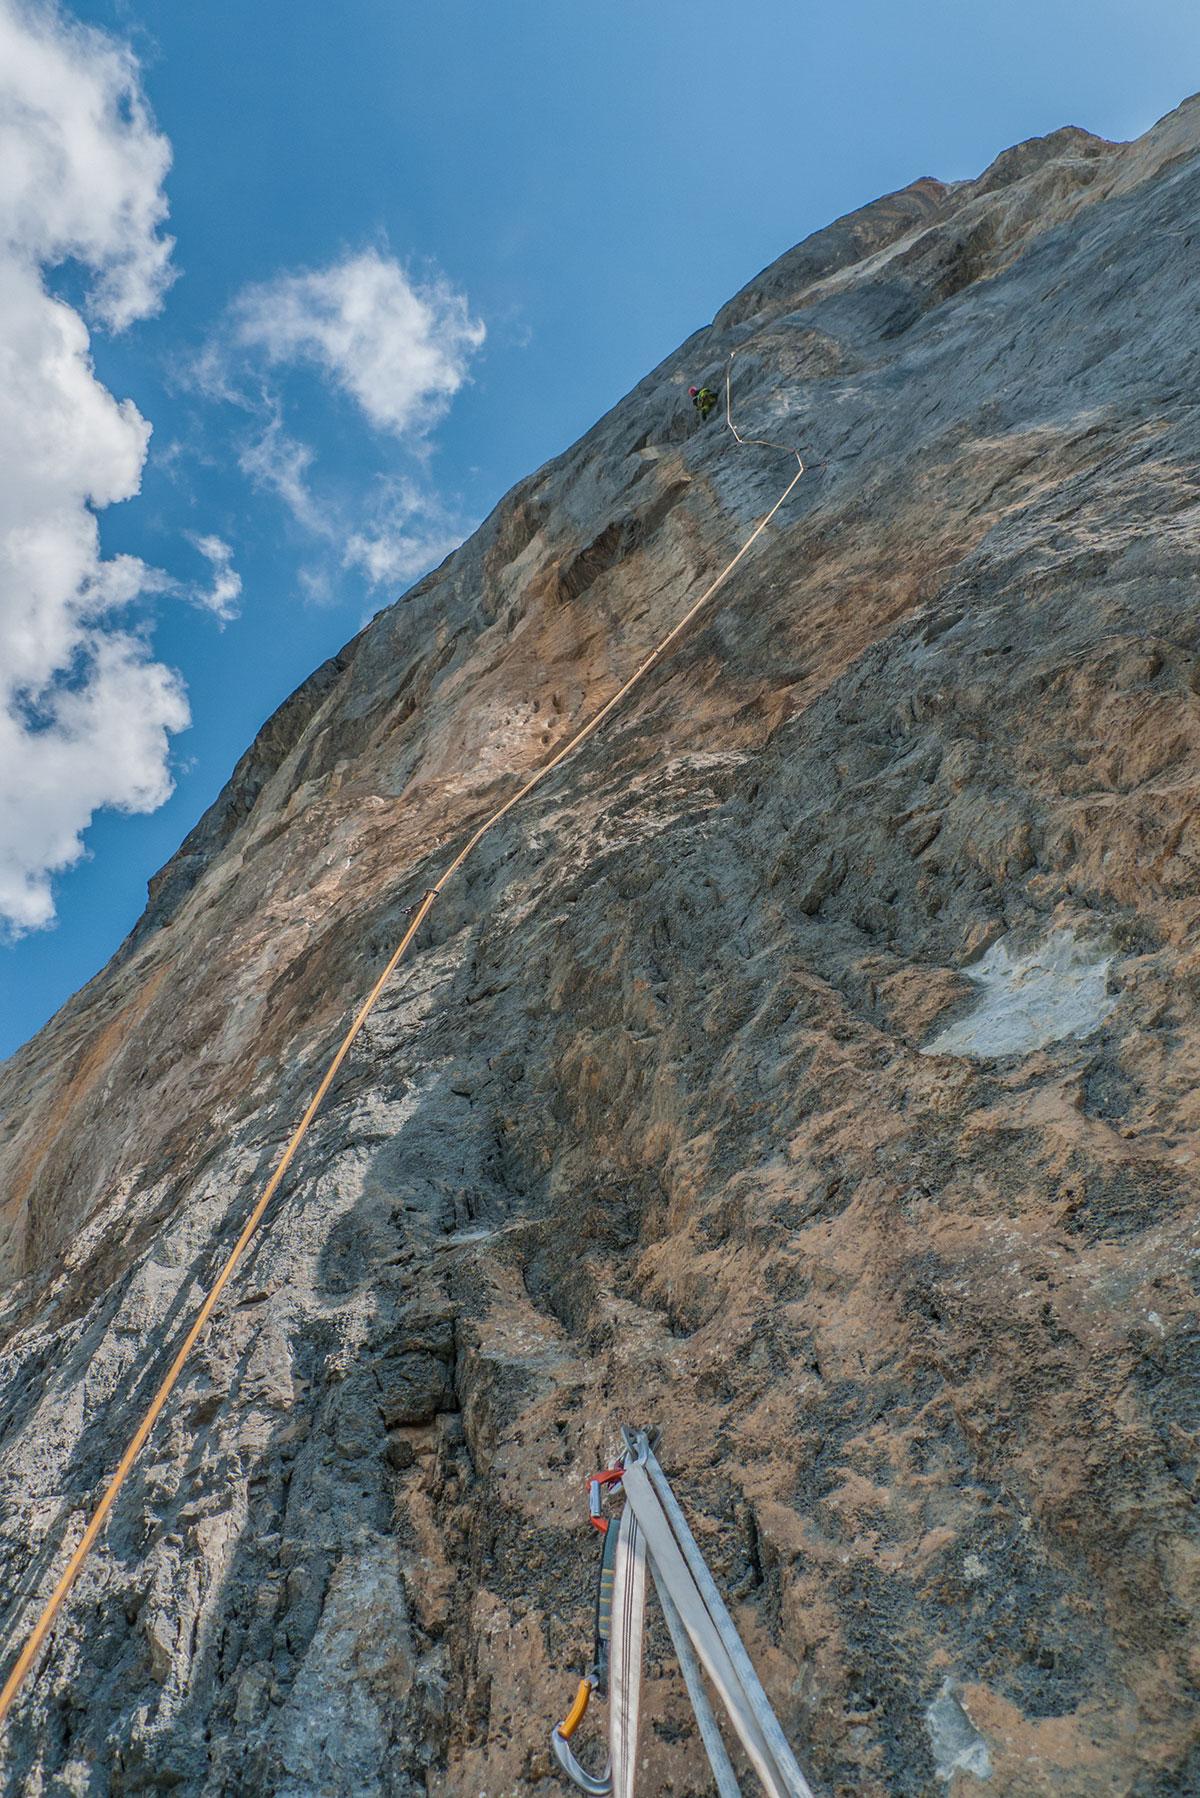 Eiger - Genfer Pfeiler - pitch 5 - (7a+)